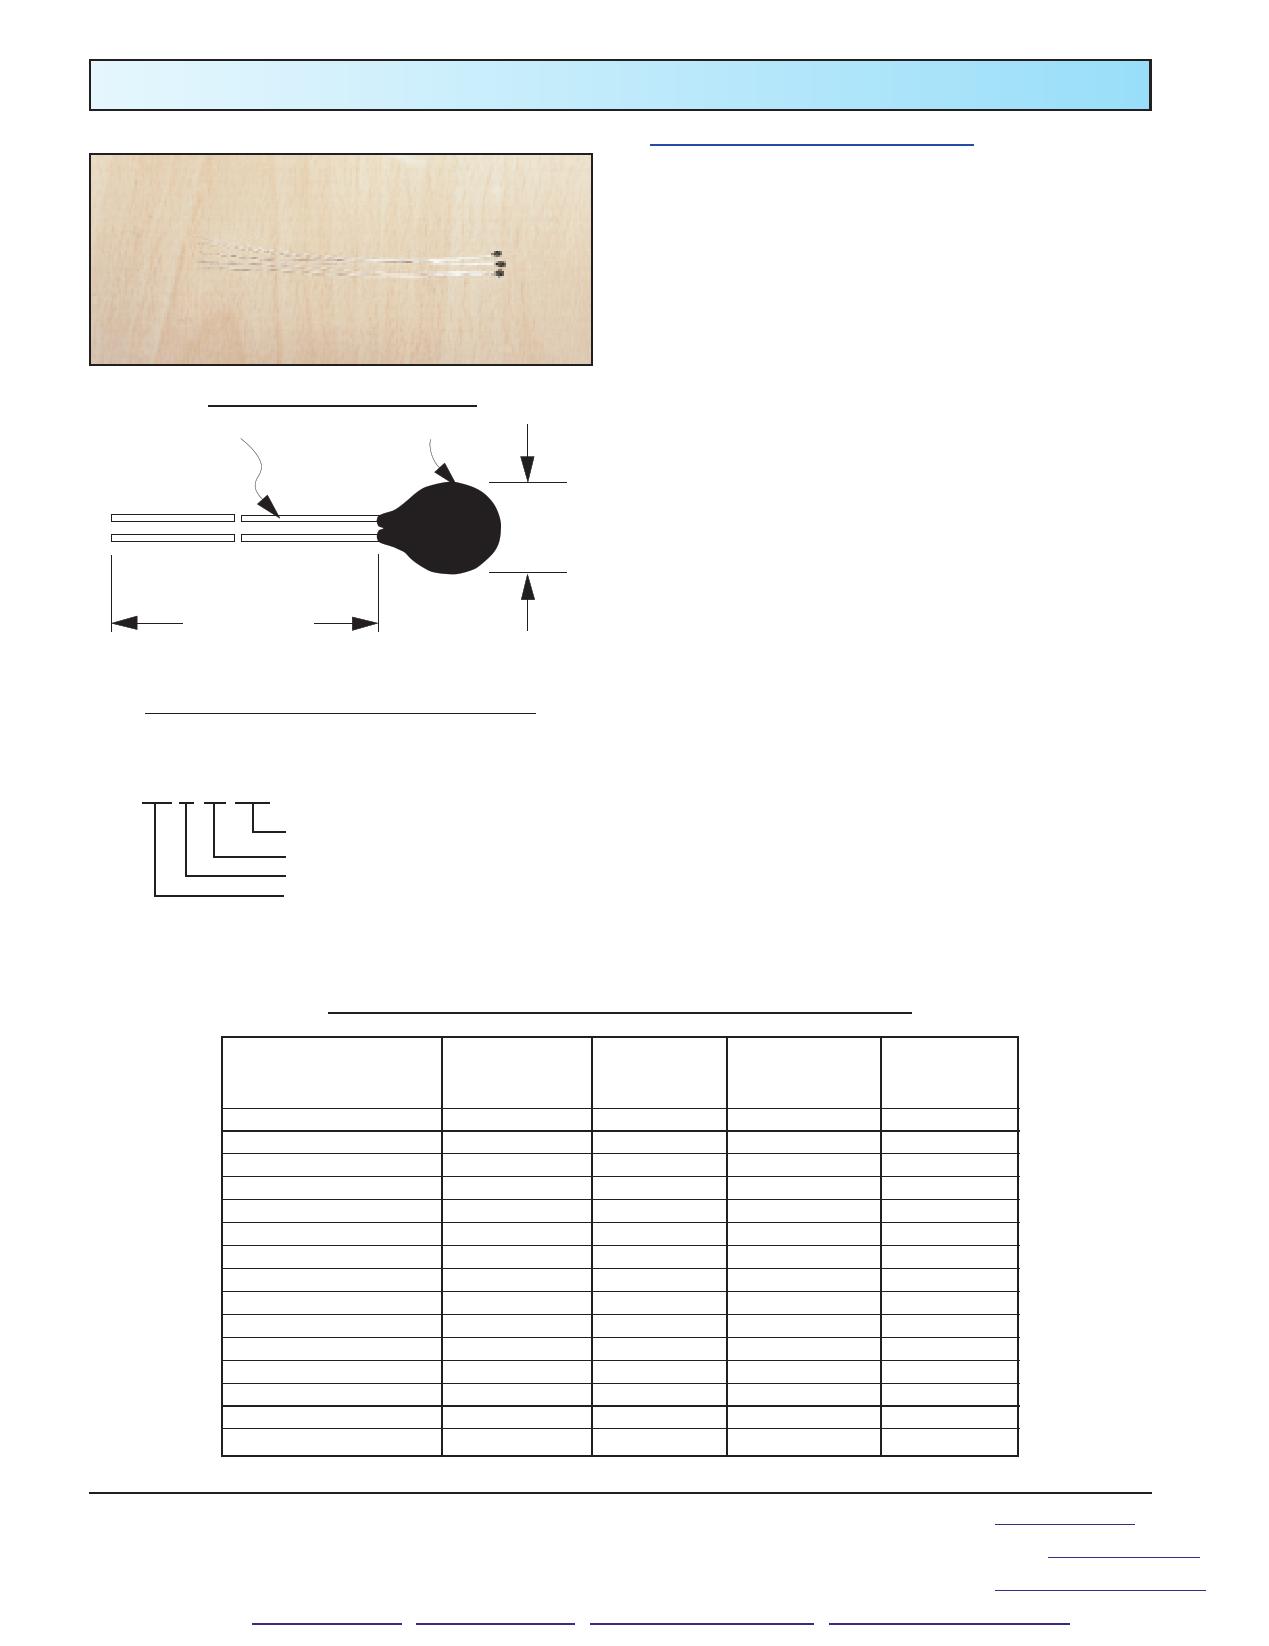 2.2K3A1-25 datasheet